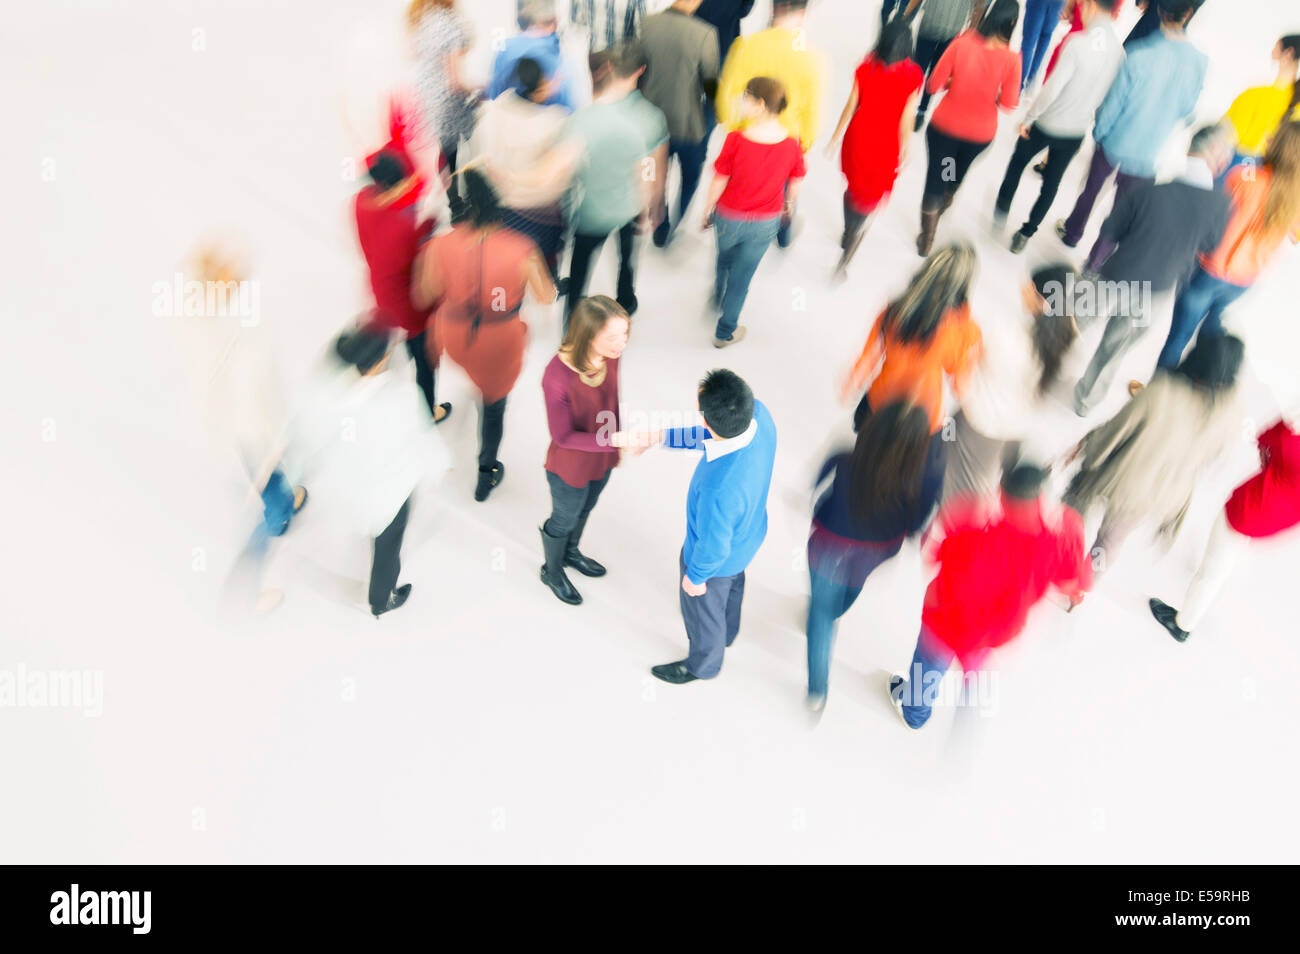 Business people handshaking in crowd - Stock Image